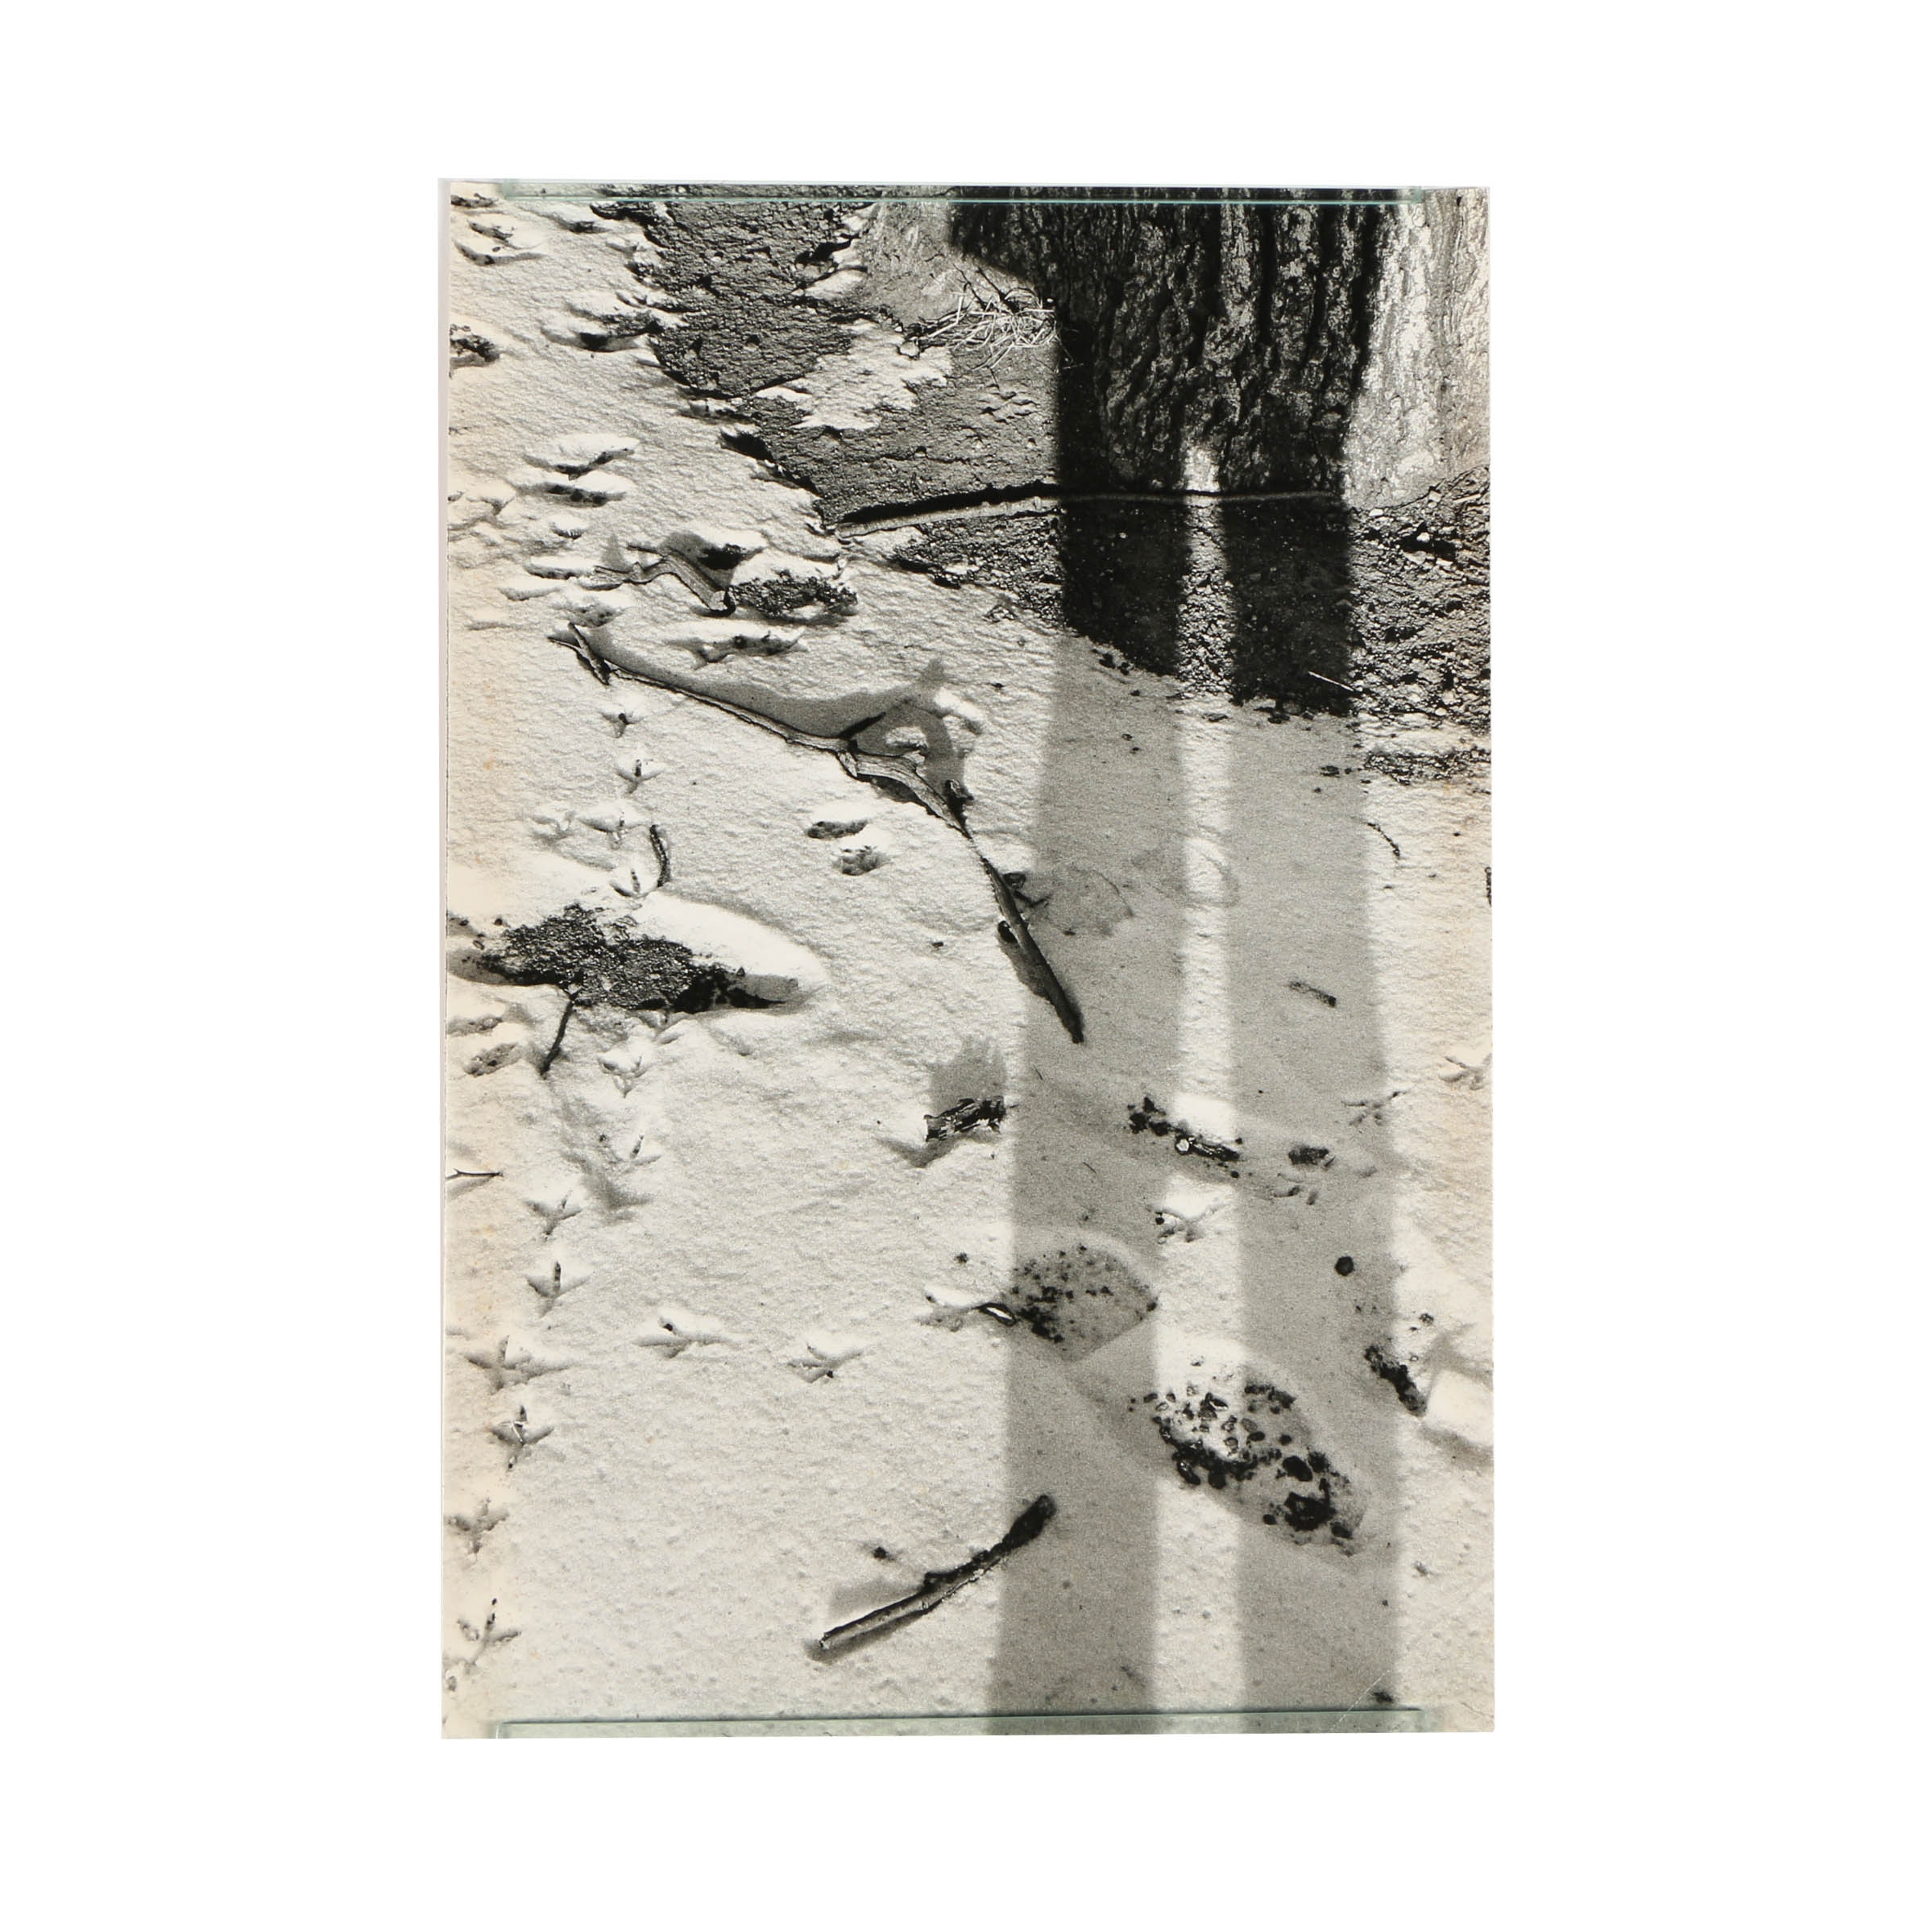 Don Werner Analog Photograph